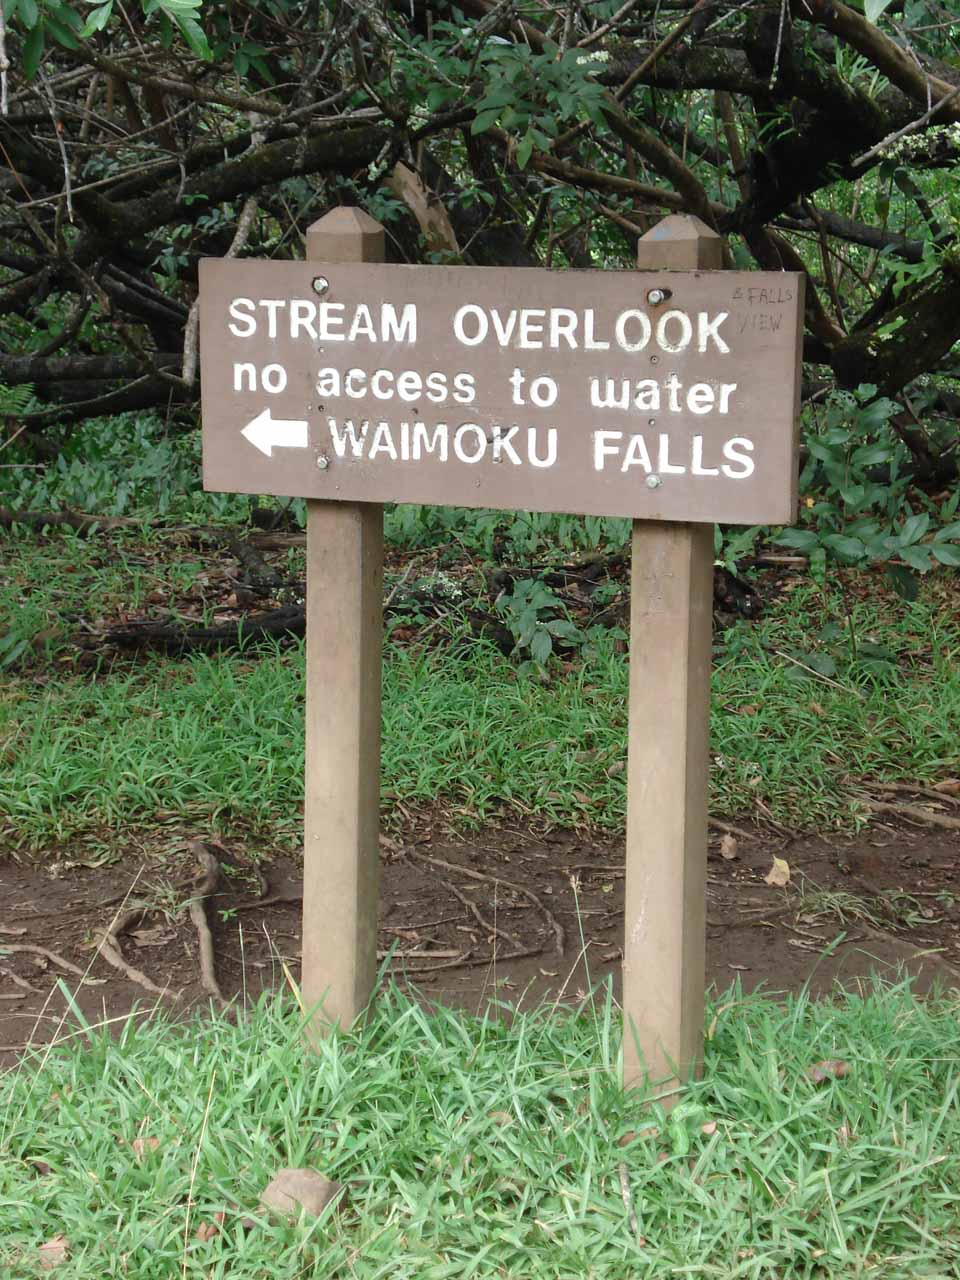 Stream Overlook sign past the banyan tree